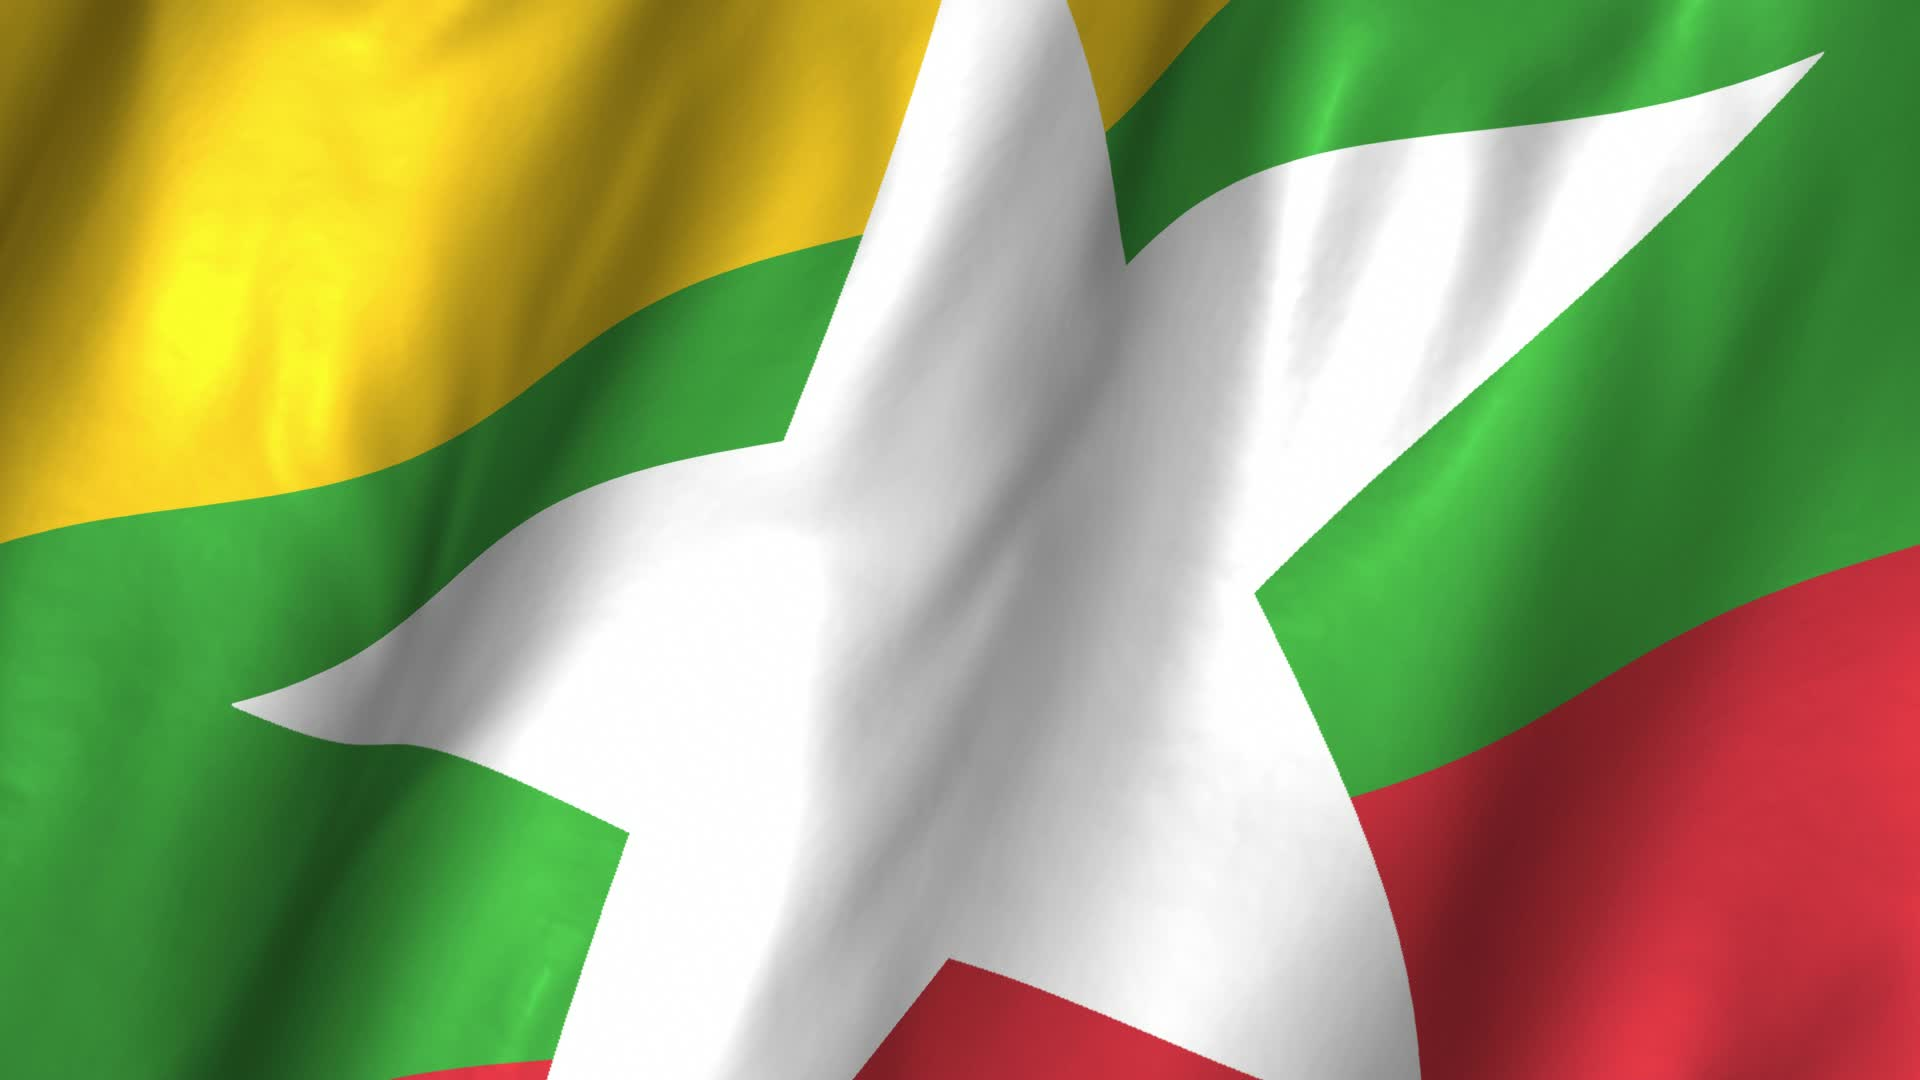 Burmese Flag Image